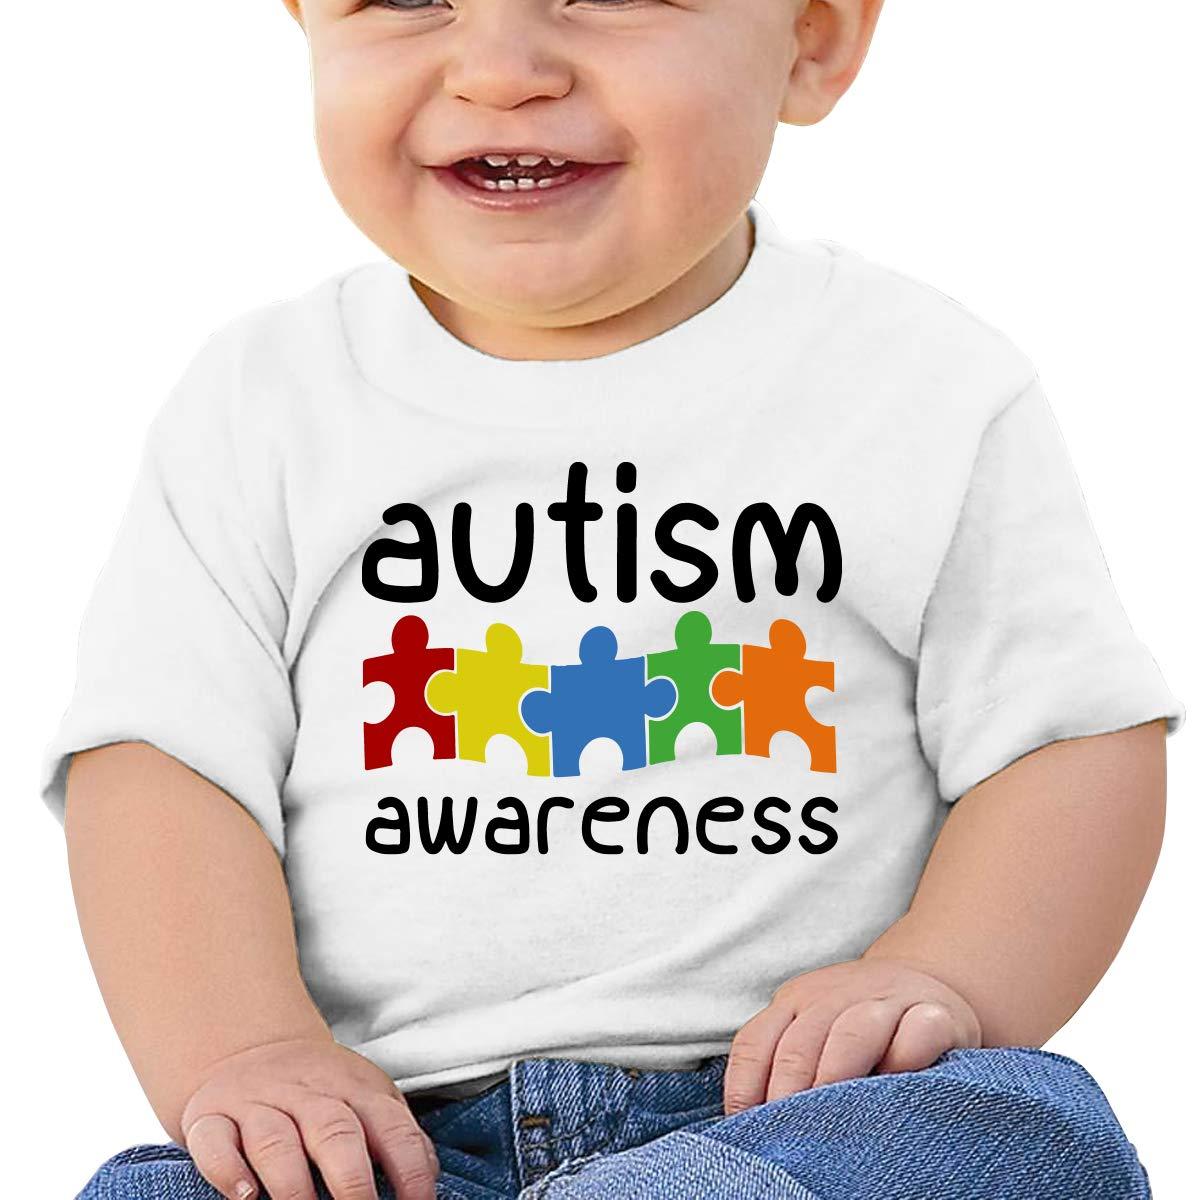 Autism Awareness Newborn Baby Short Sleeve Crewneck Tee Shirt 6-18 Month Tops